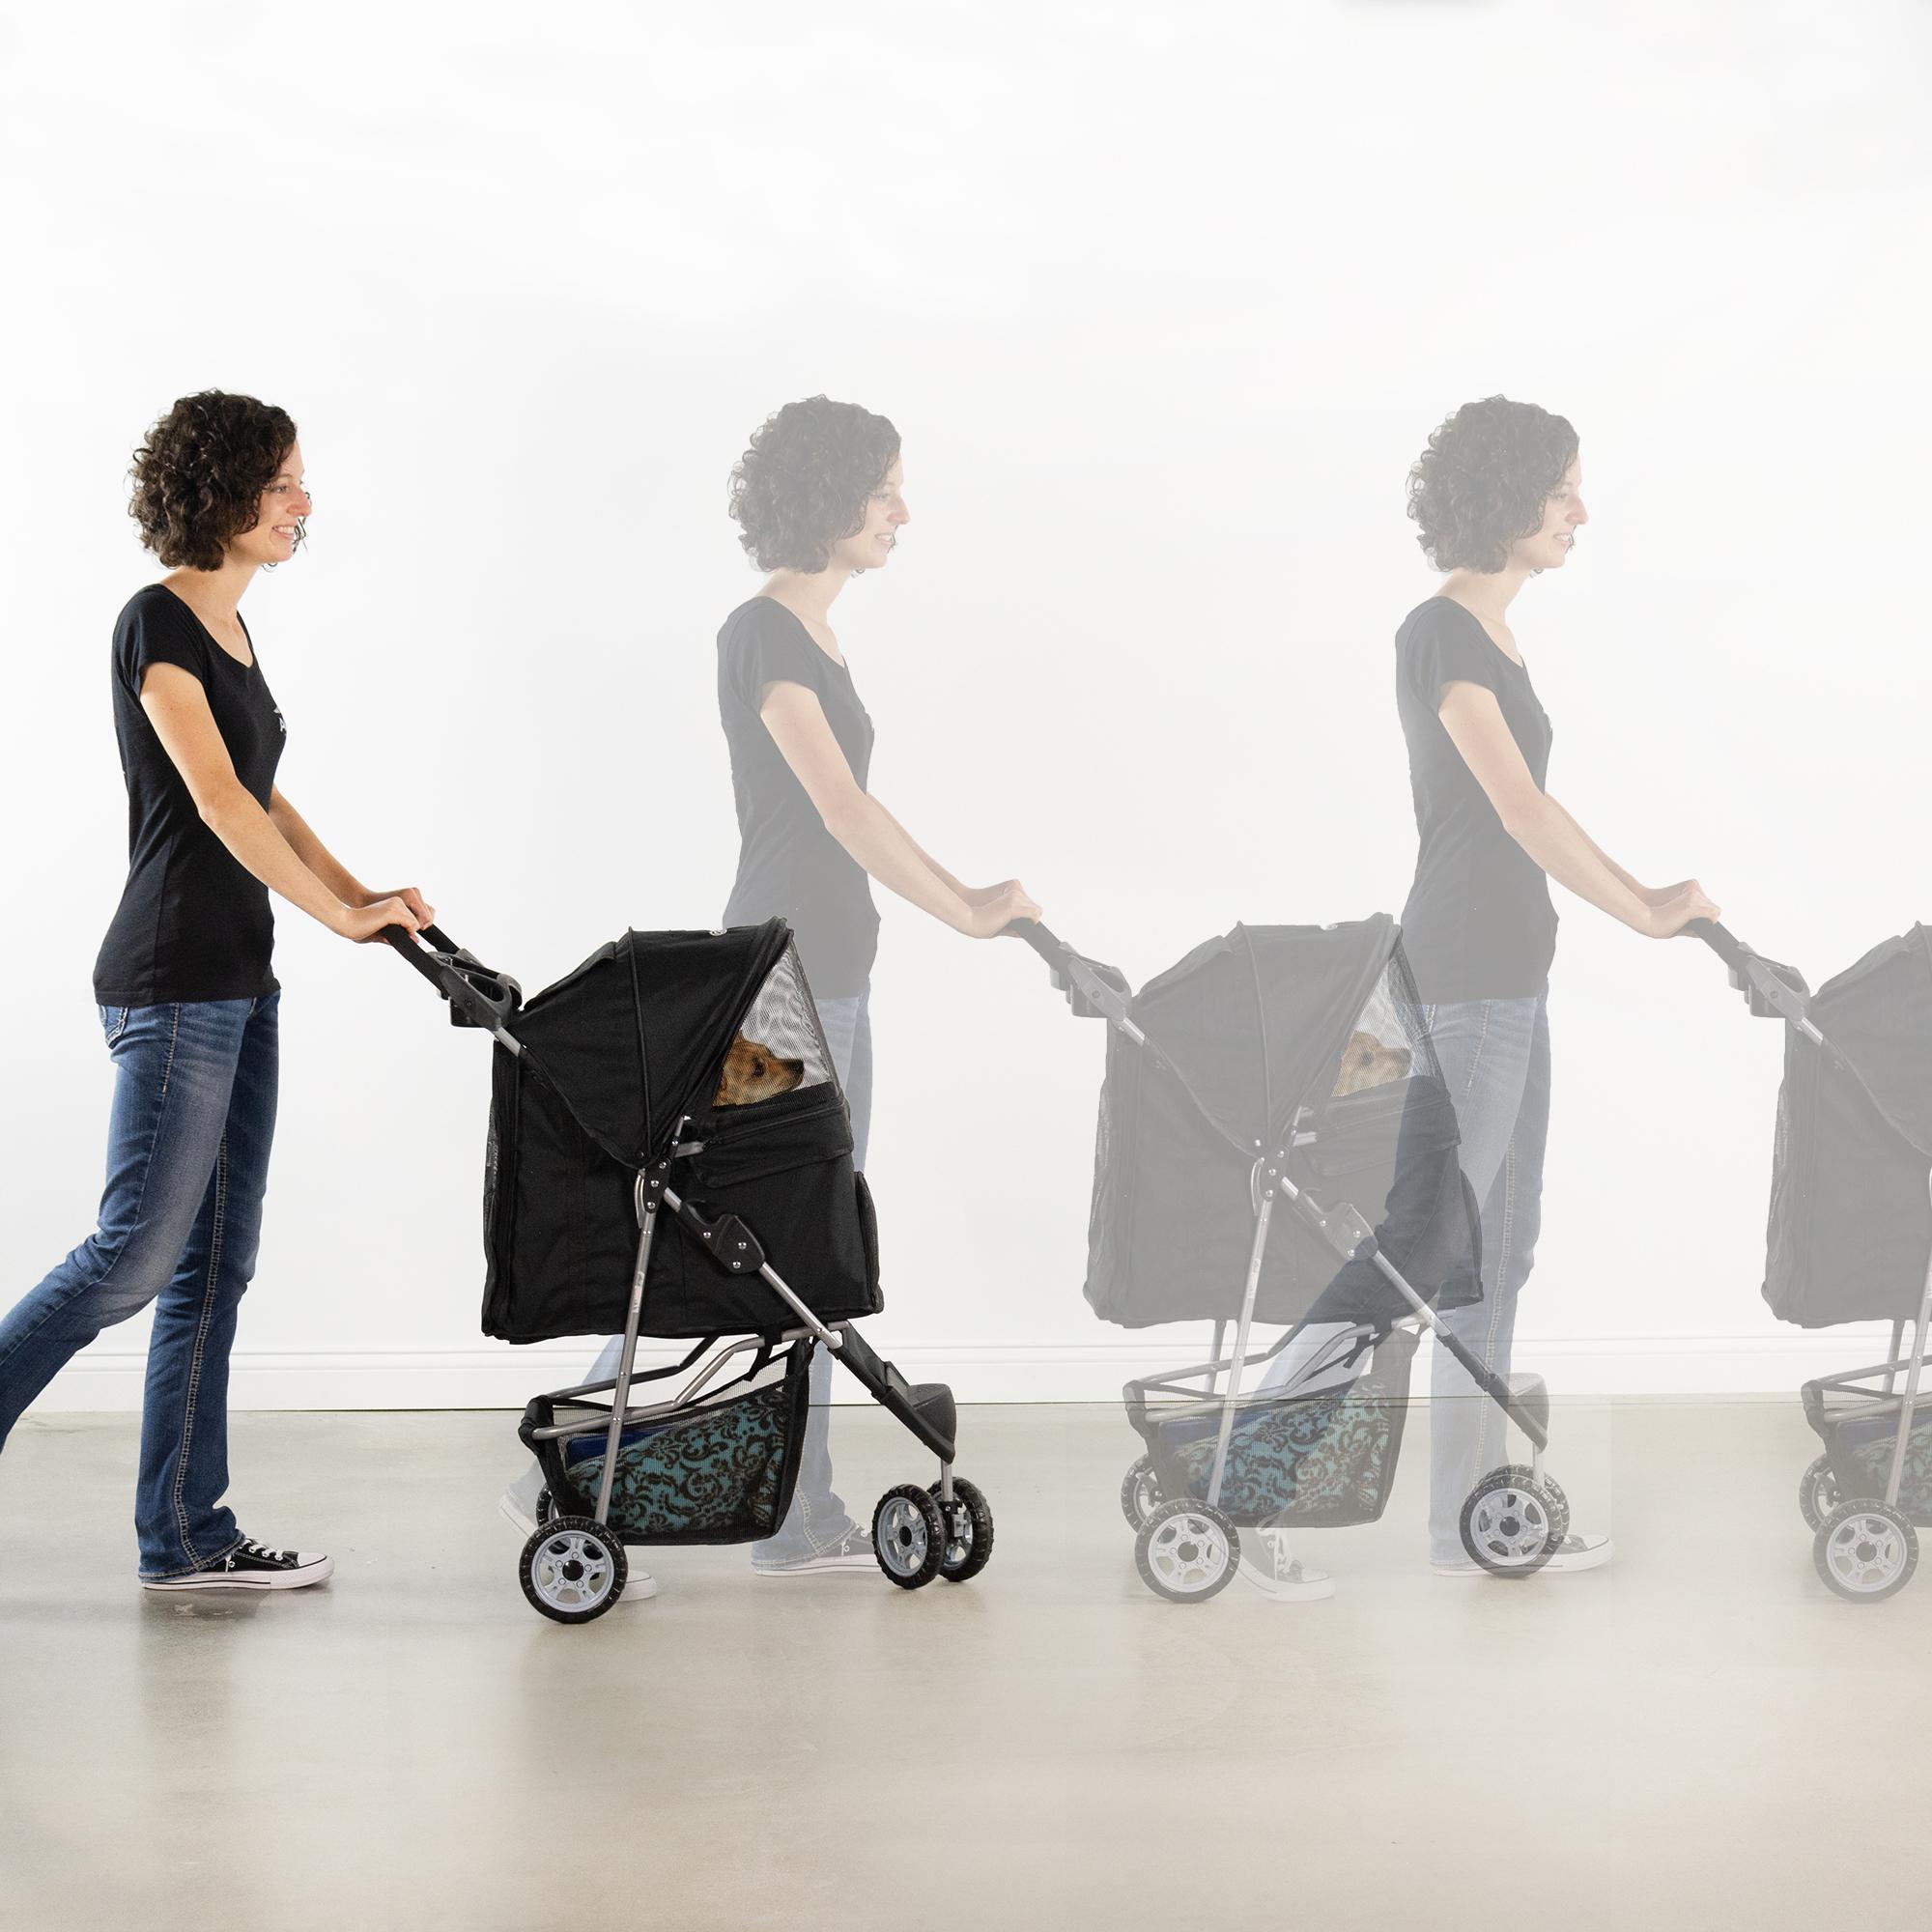 thumbnail 6 - VIVO Three Wheel Pet Stroller / Cat & Dog Foldable Carrier Strolling Cart